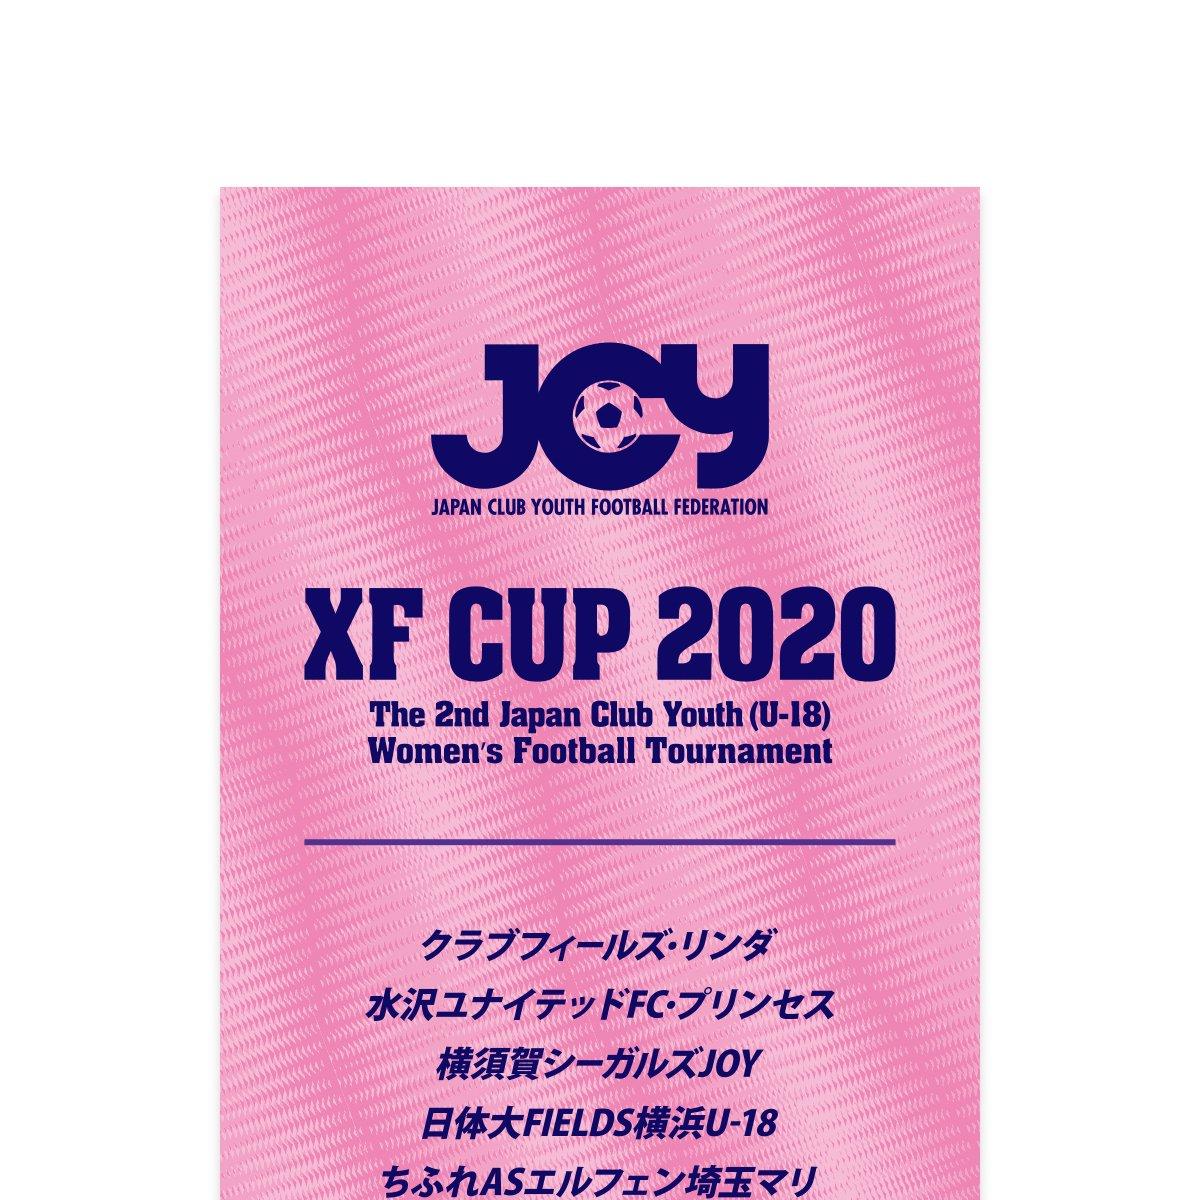 XF CUP 2020 第2回 日本クラブユース女子サッカー大会(U-18)オフィシャル記念タオル